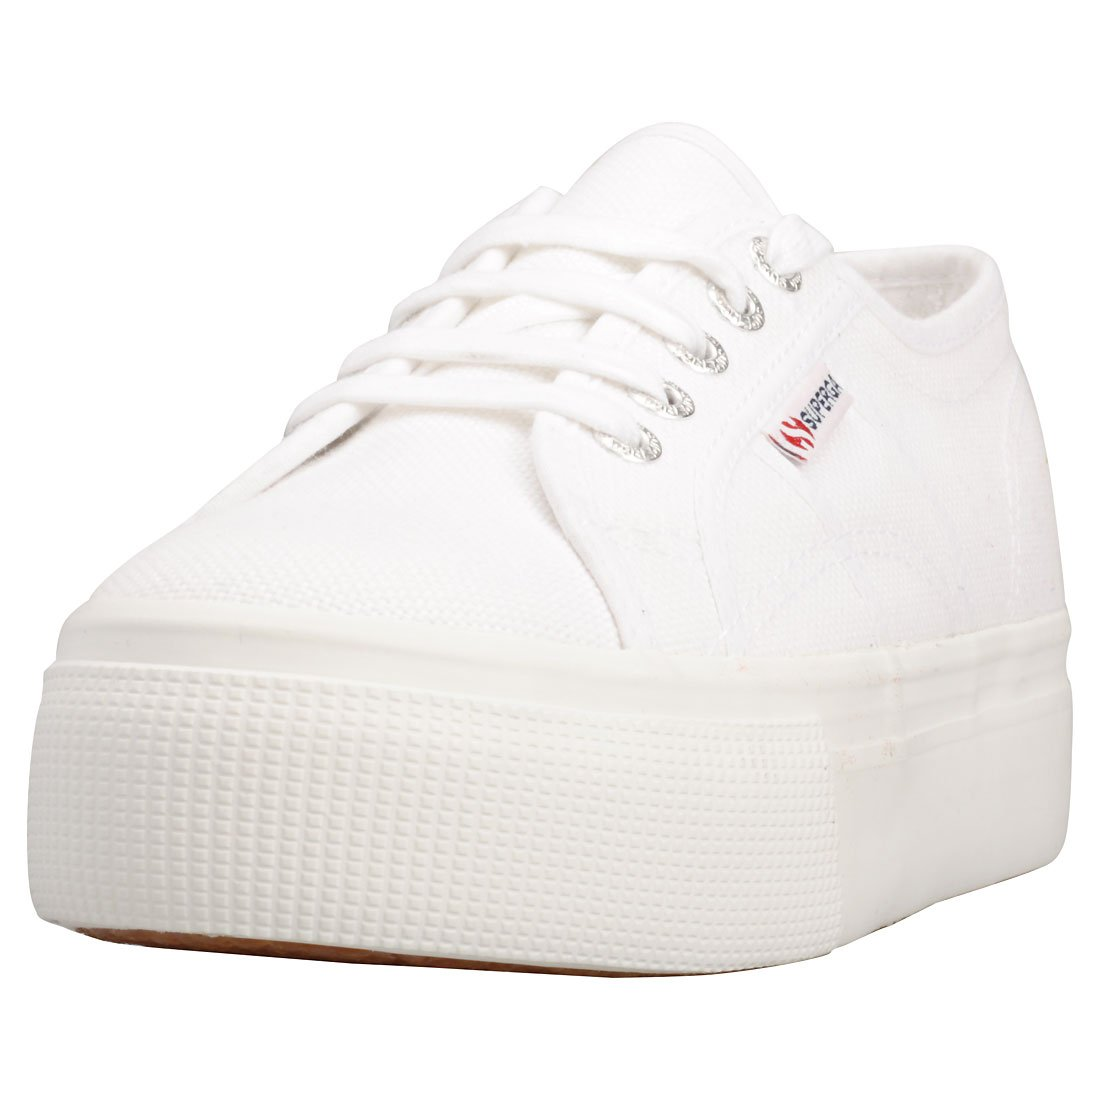 Blanc (blanc) Superga - 2790 Acotw - paniers basses - femme